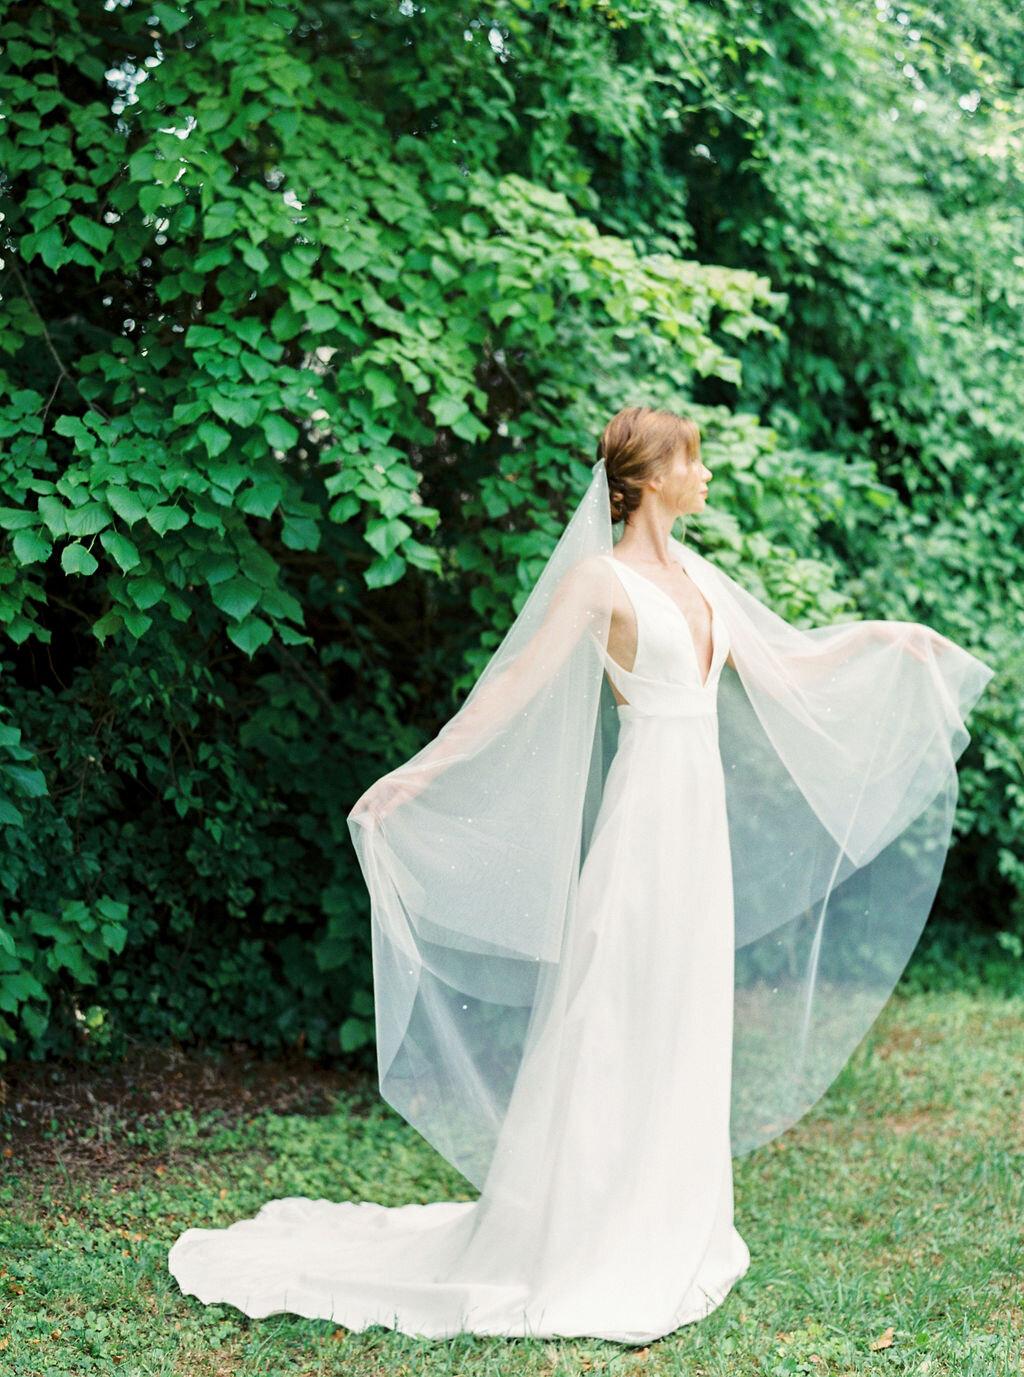 Wedding_Veil_Madame_Tulle_Amelia_Soegijono0056.JPG